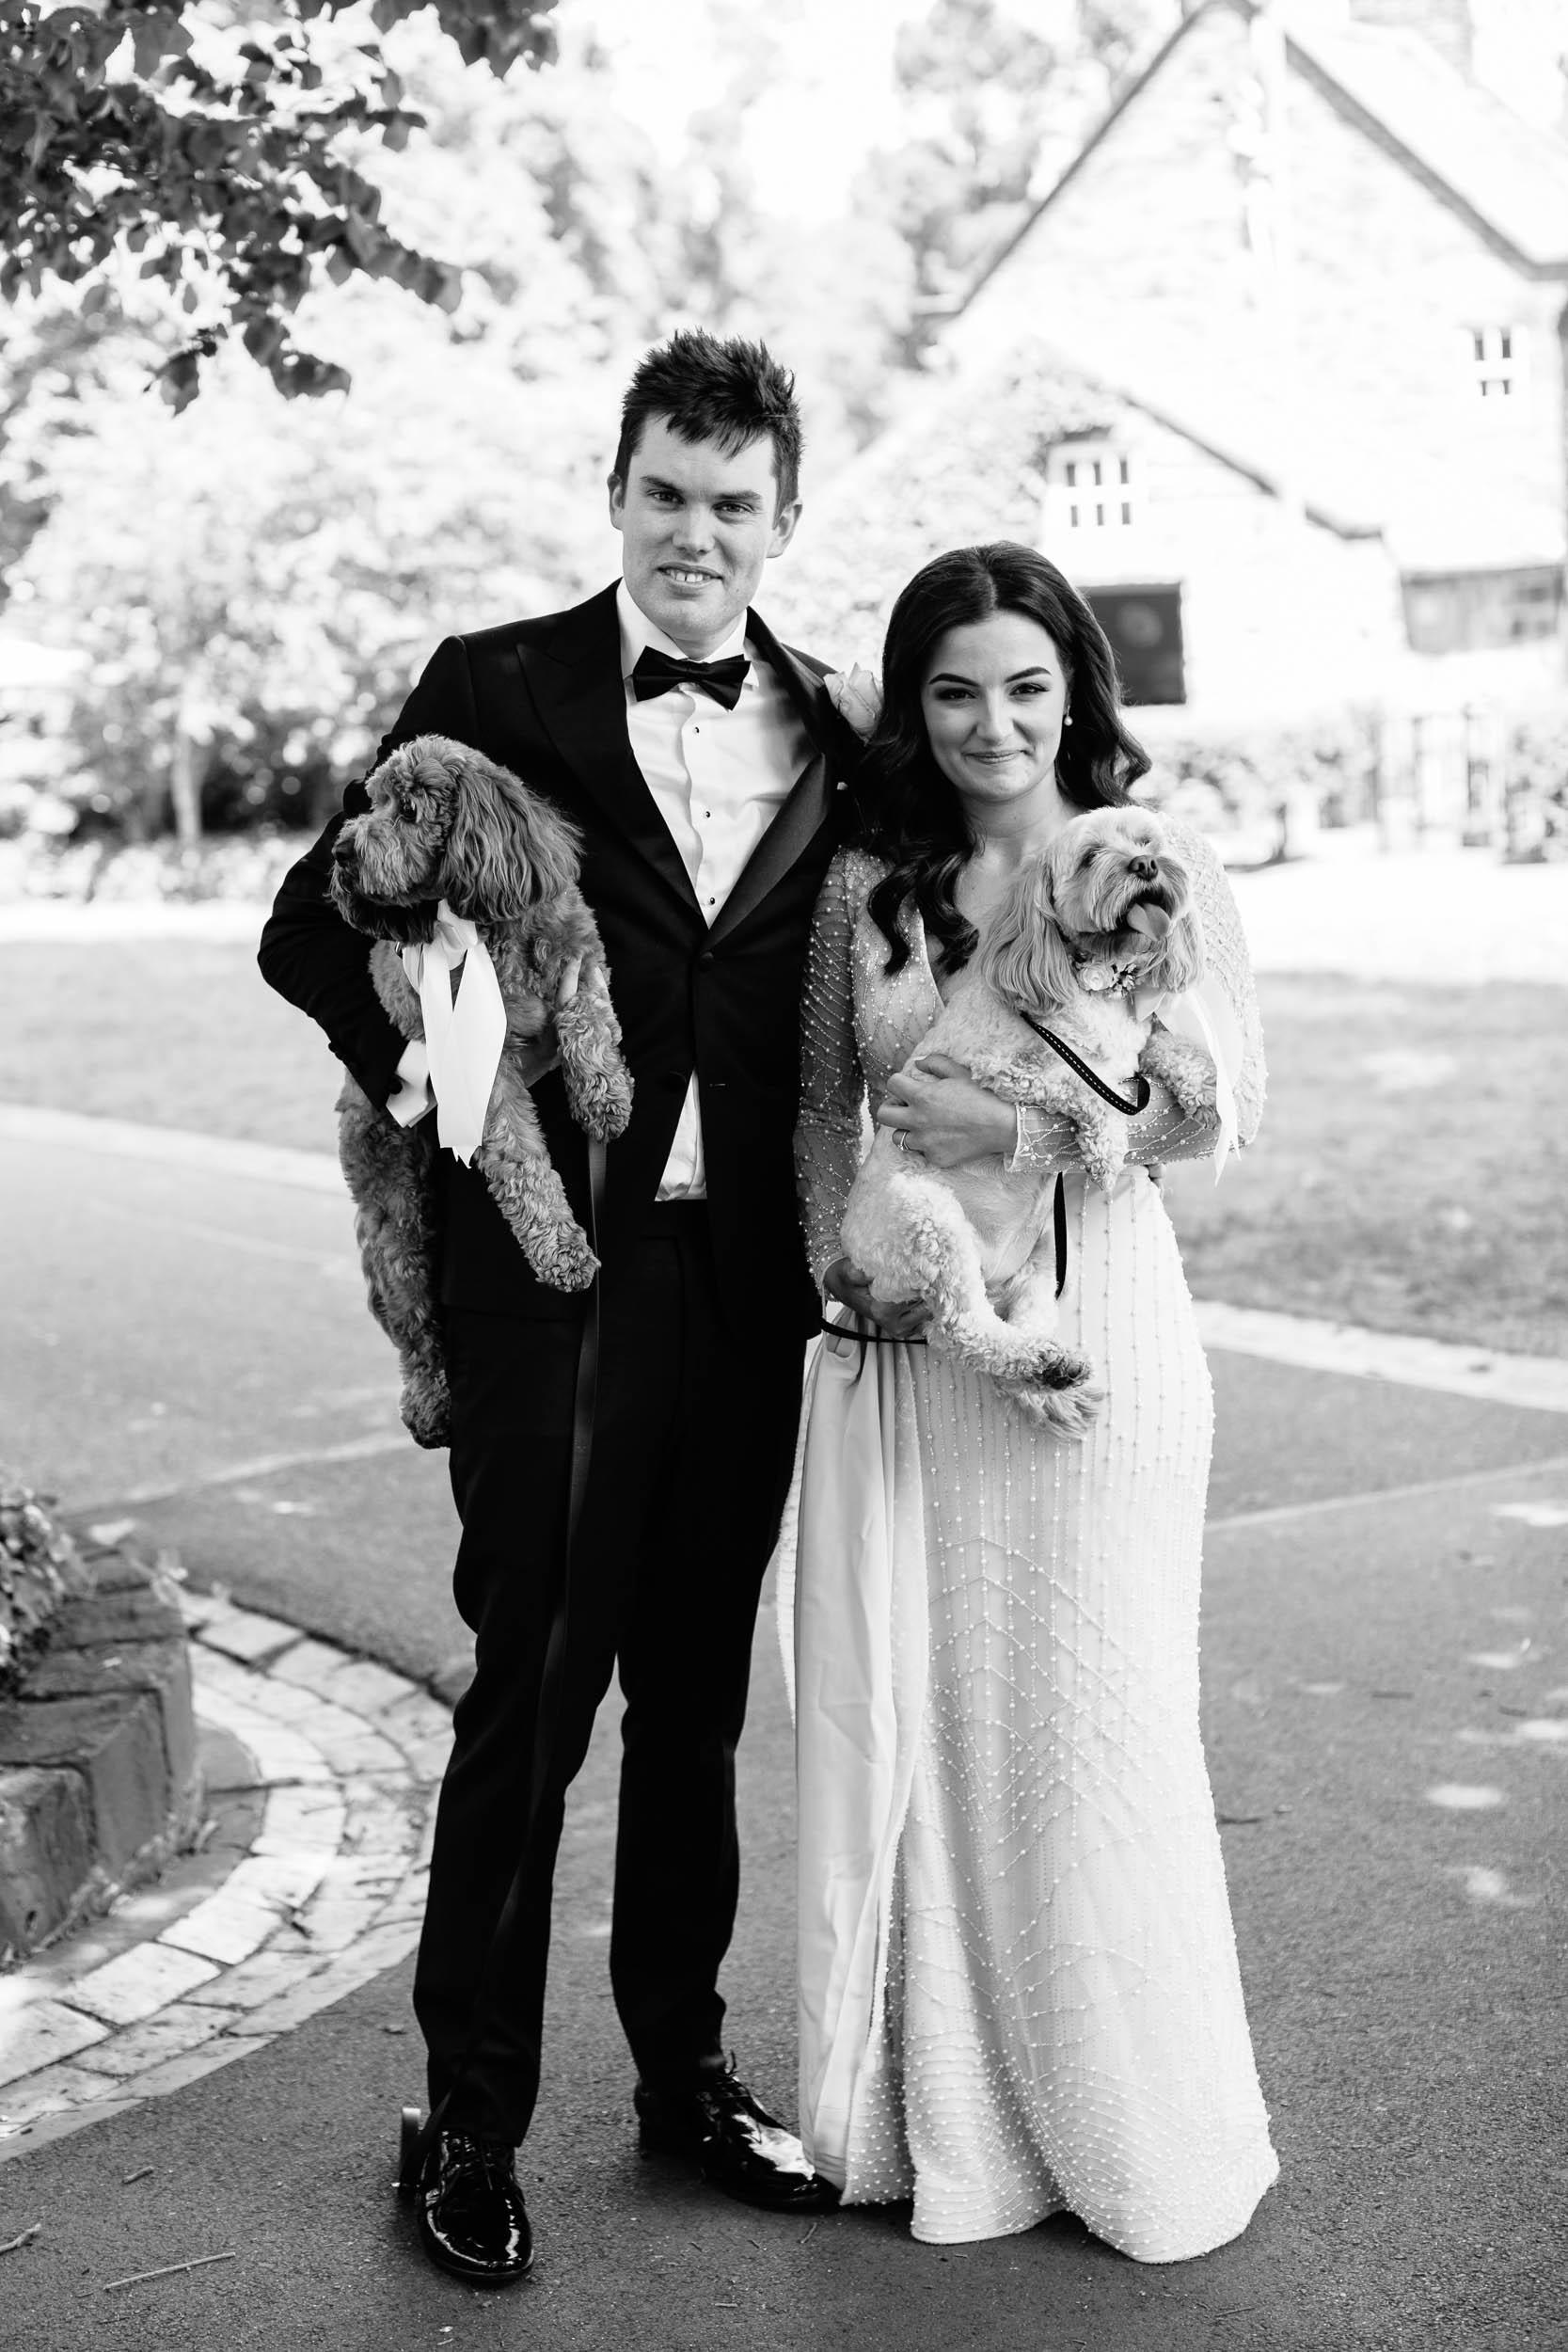 Kas-Richards-Wedding-Photographer-Melbourne-City-Wedding-Alto-Event-Space-Jane-Hill-Bridal-Gown-8.jpg